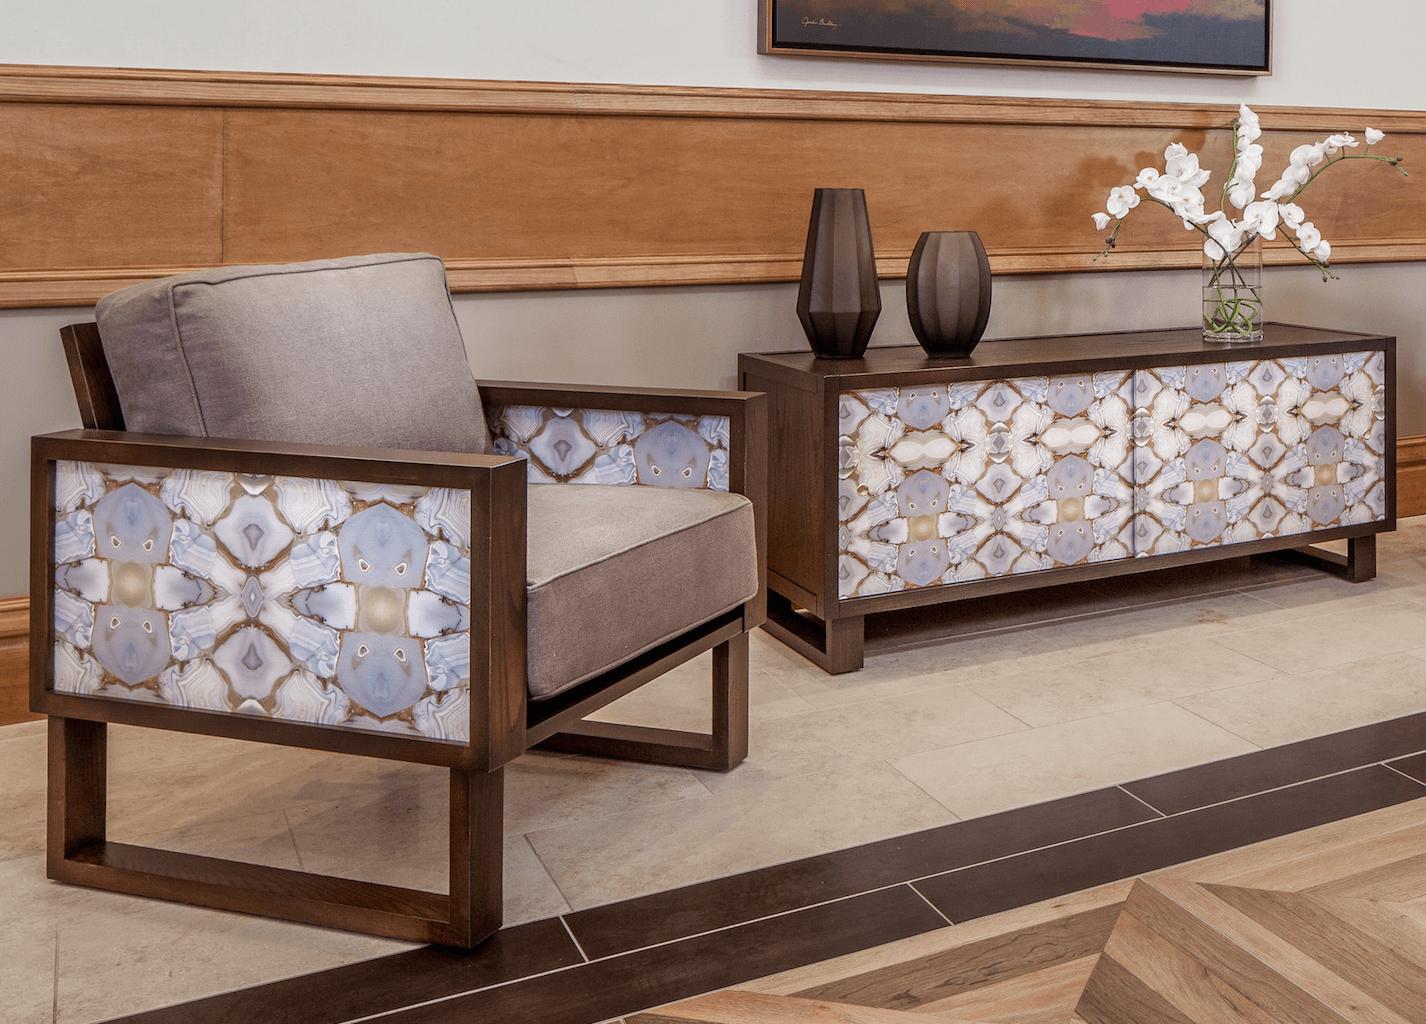 Kaleidoscopia Lounge Chair